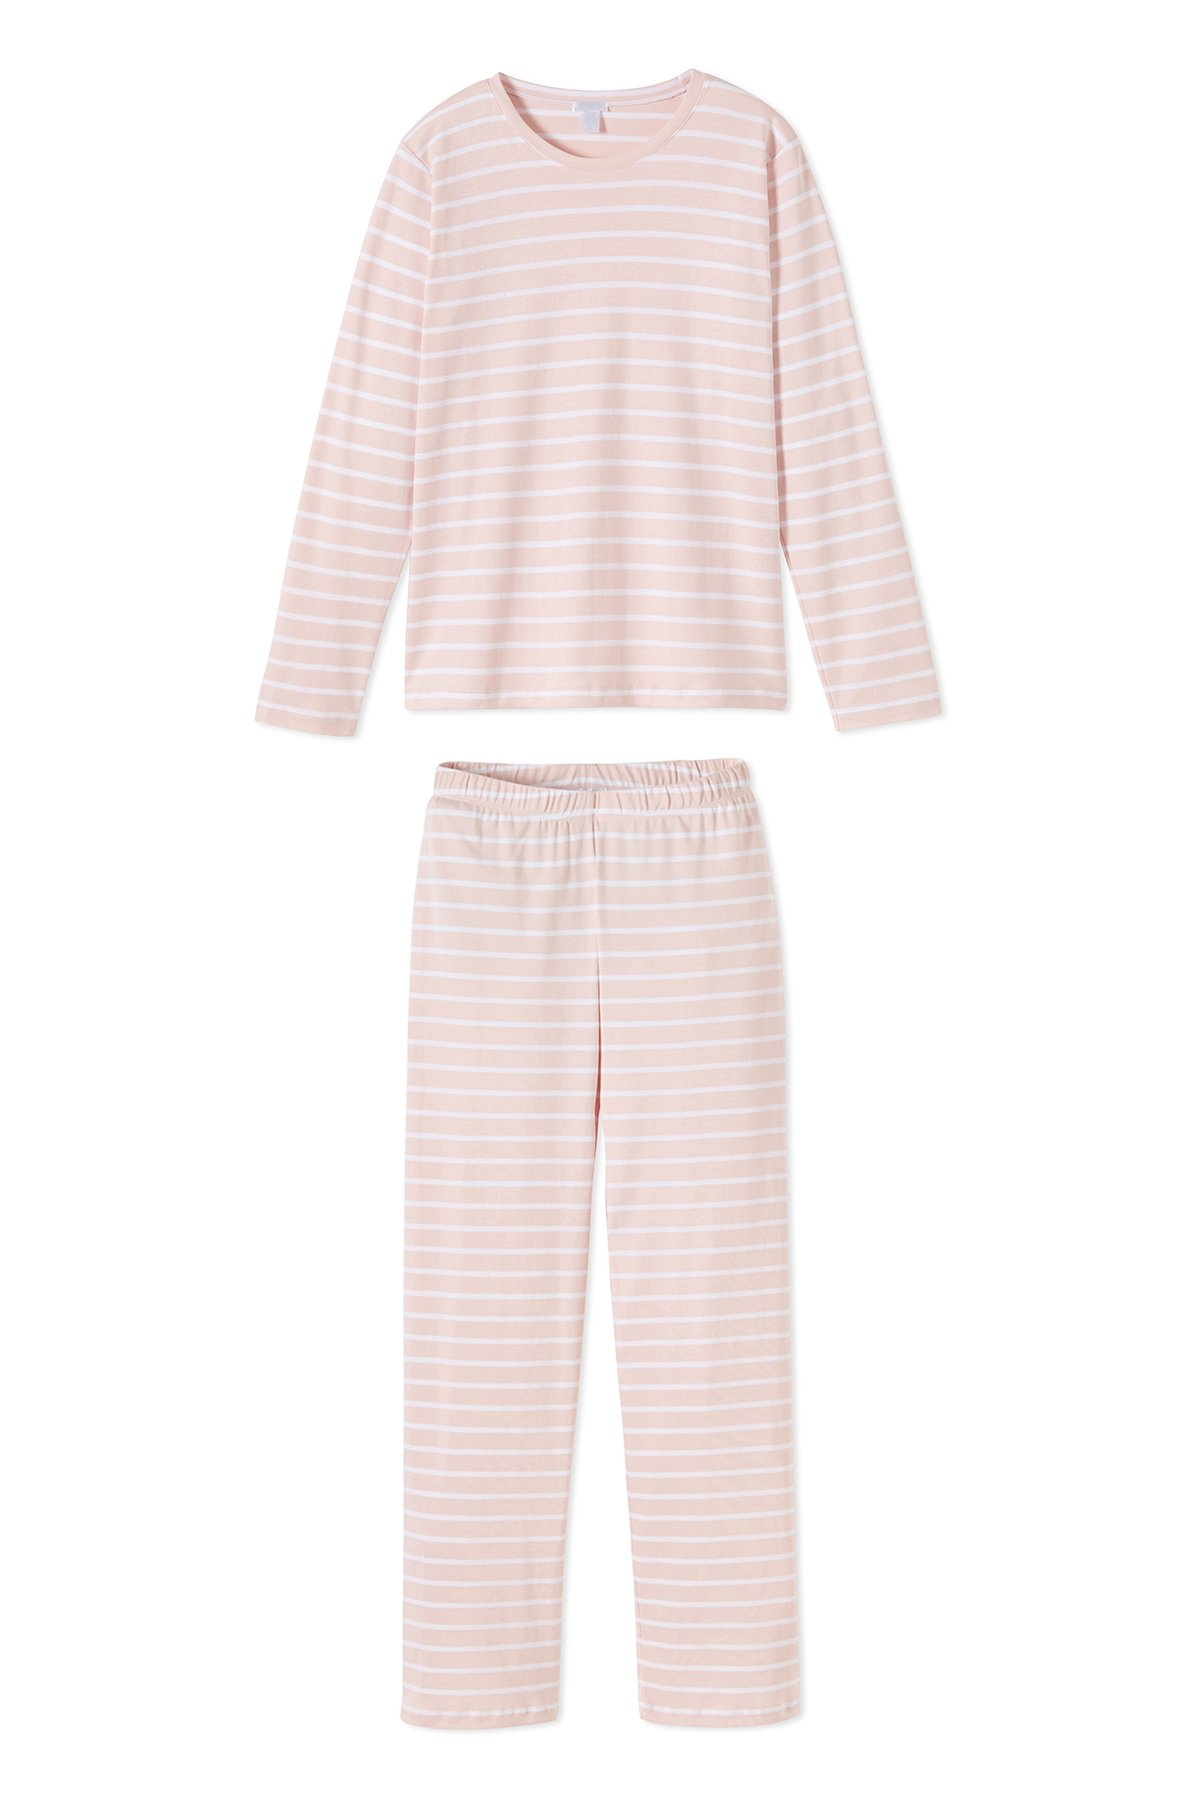 cozy comfy pajamas PJs Lake stripes quarantine uniform